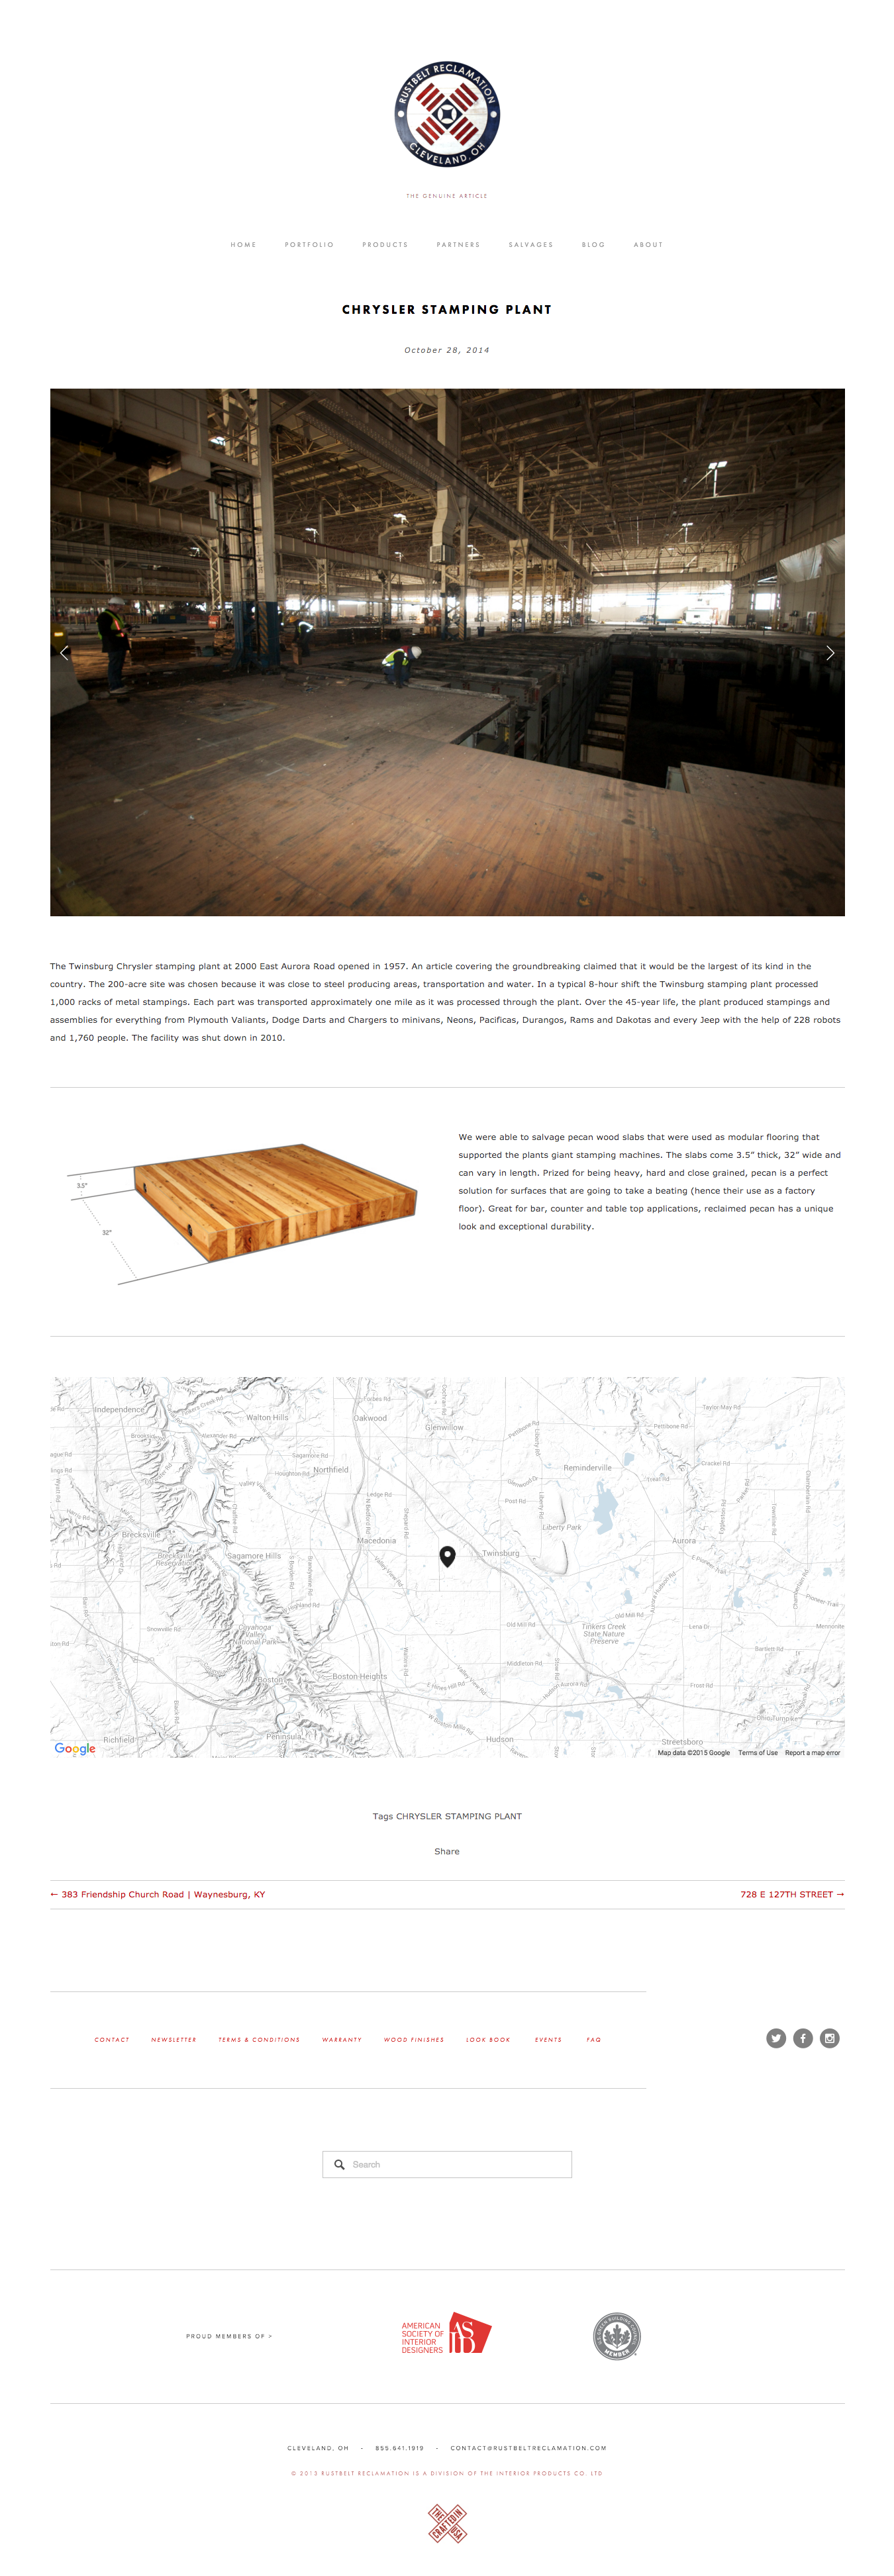 screenshot-www.rustbeltreclamation.com 2015-12-07 00-35-36.png